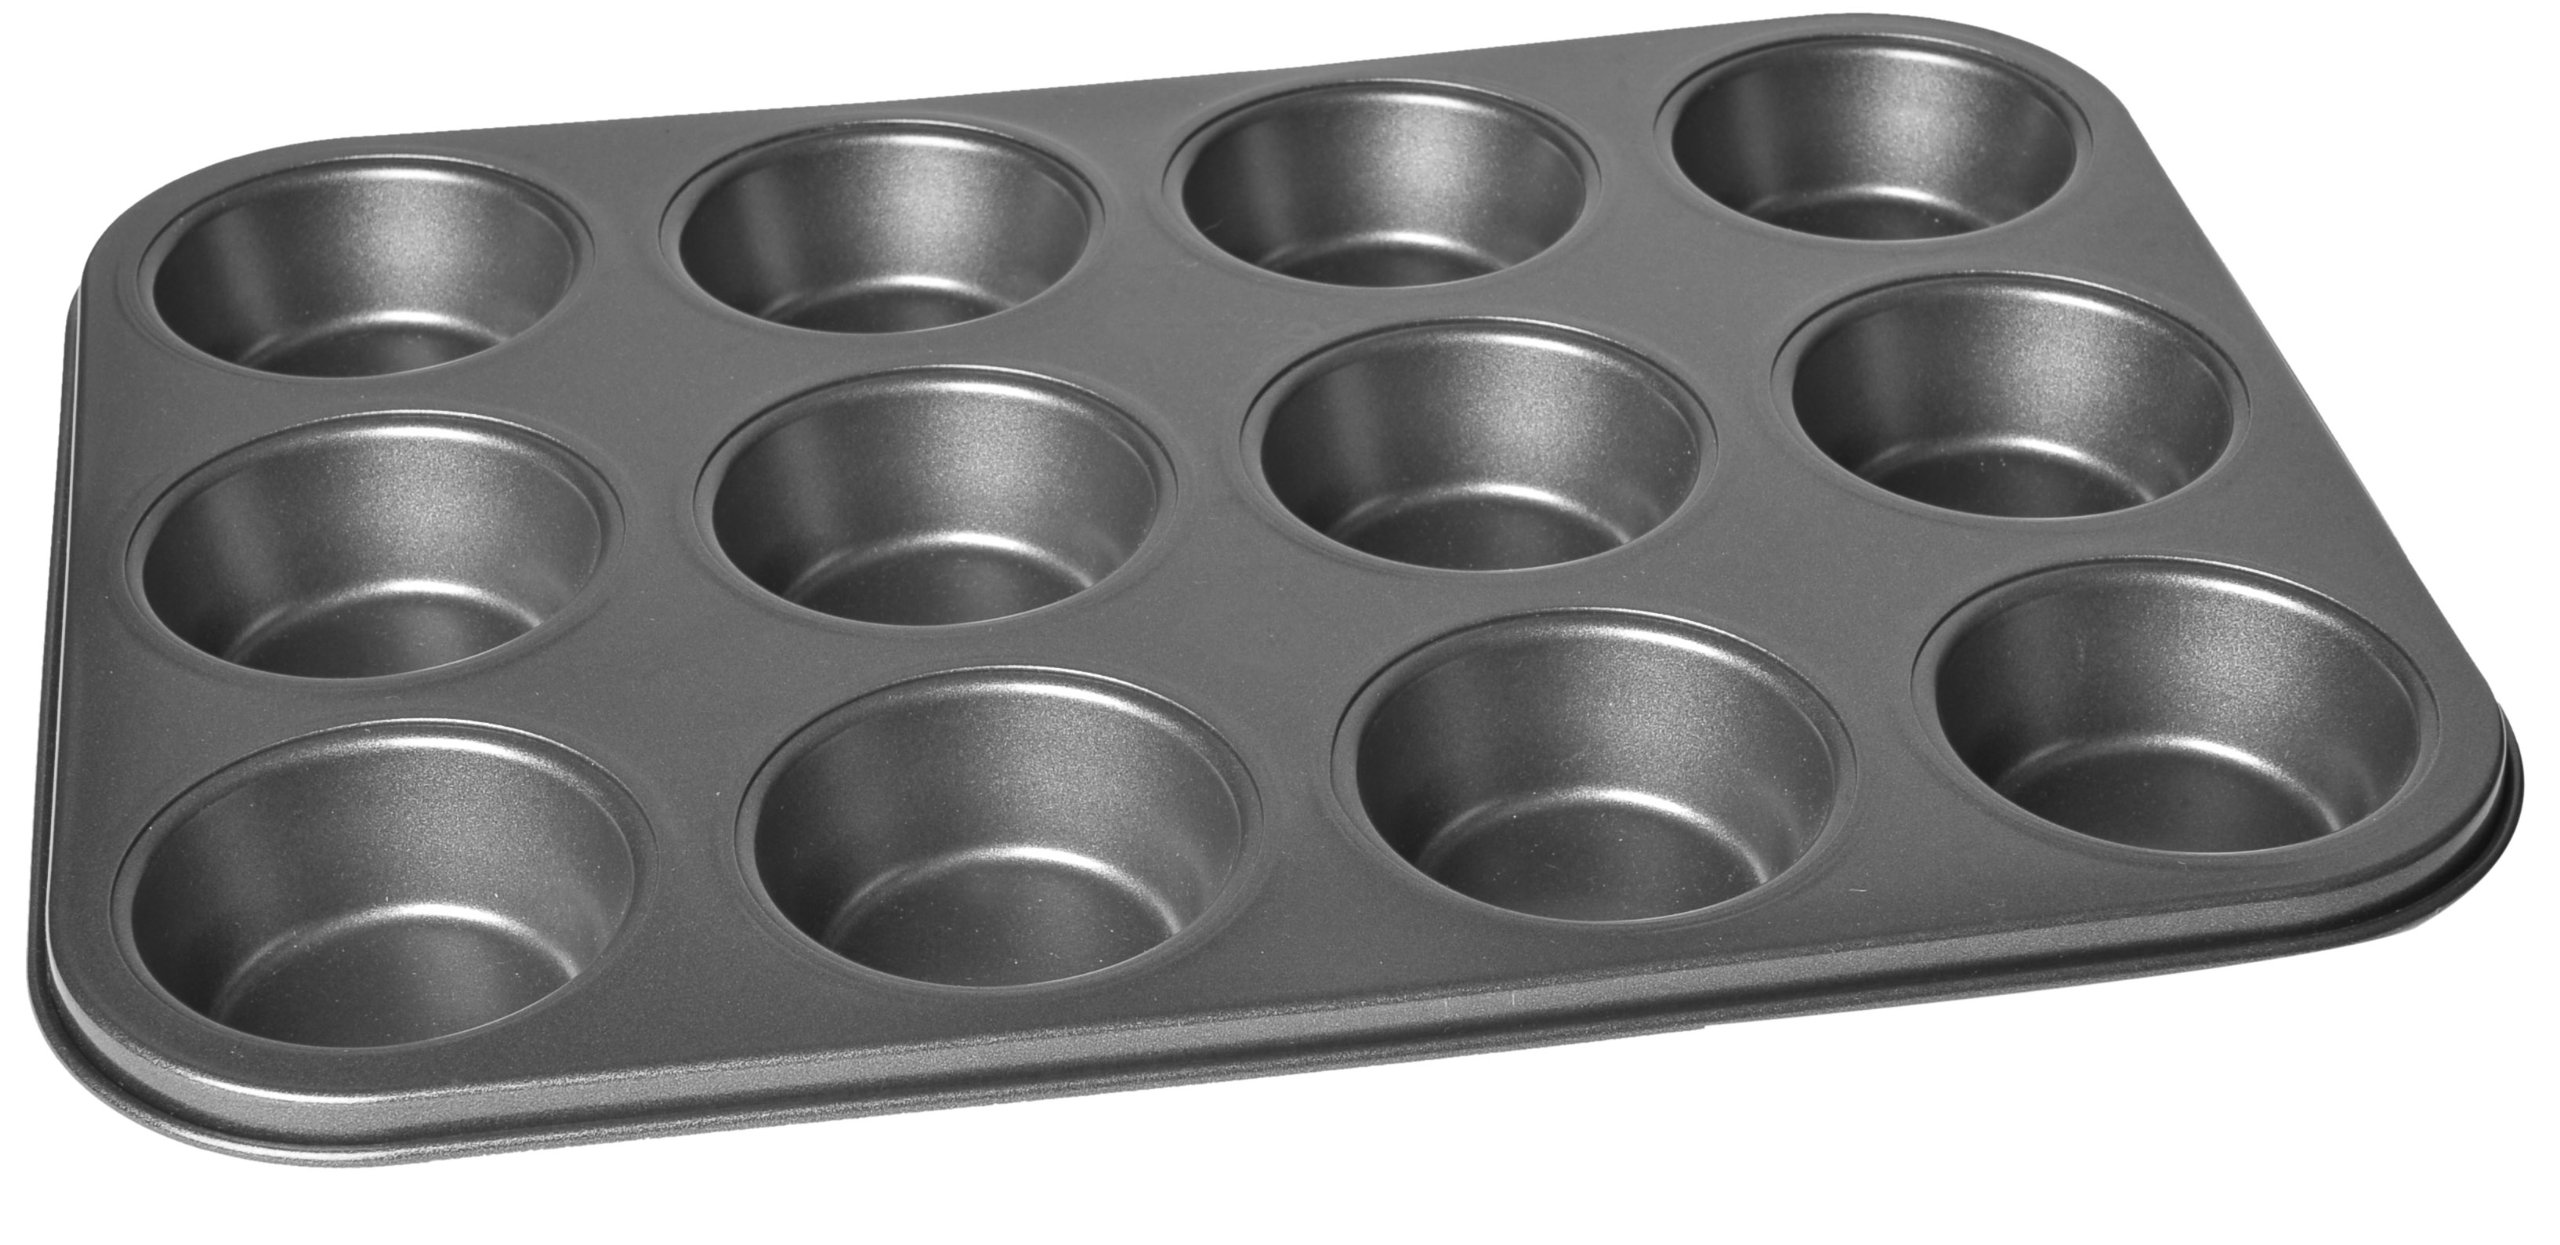 Chloe's Kitchen 201-109 Muffin Pan, 12-Cavity, Non-Stick